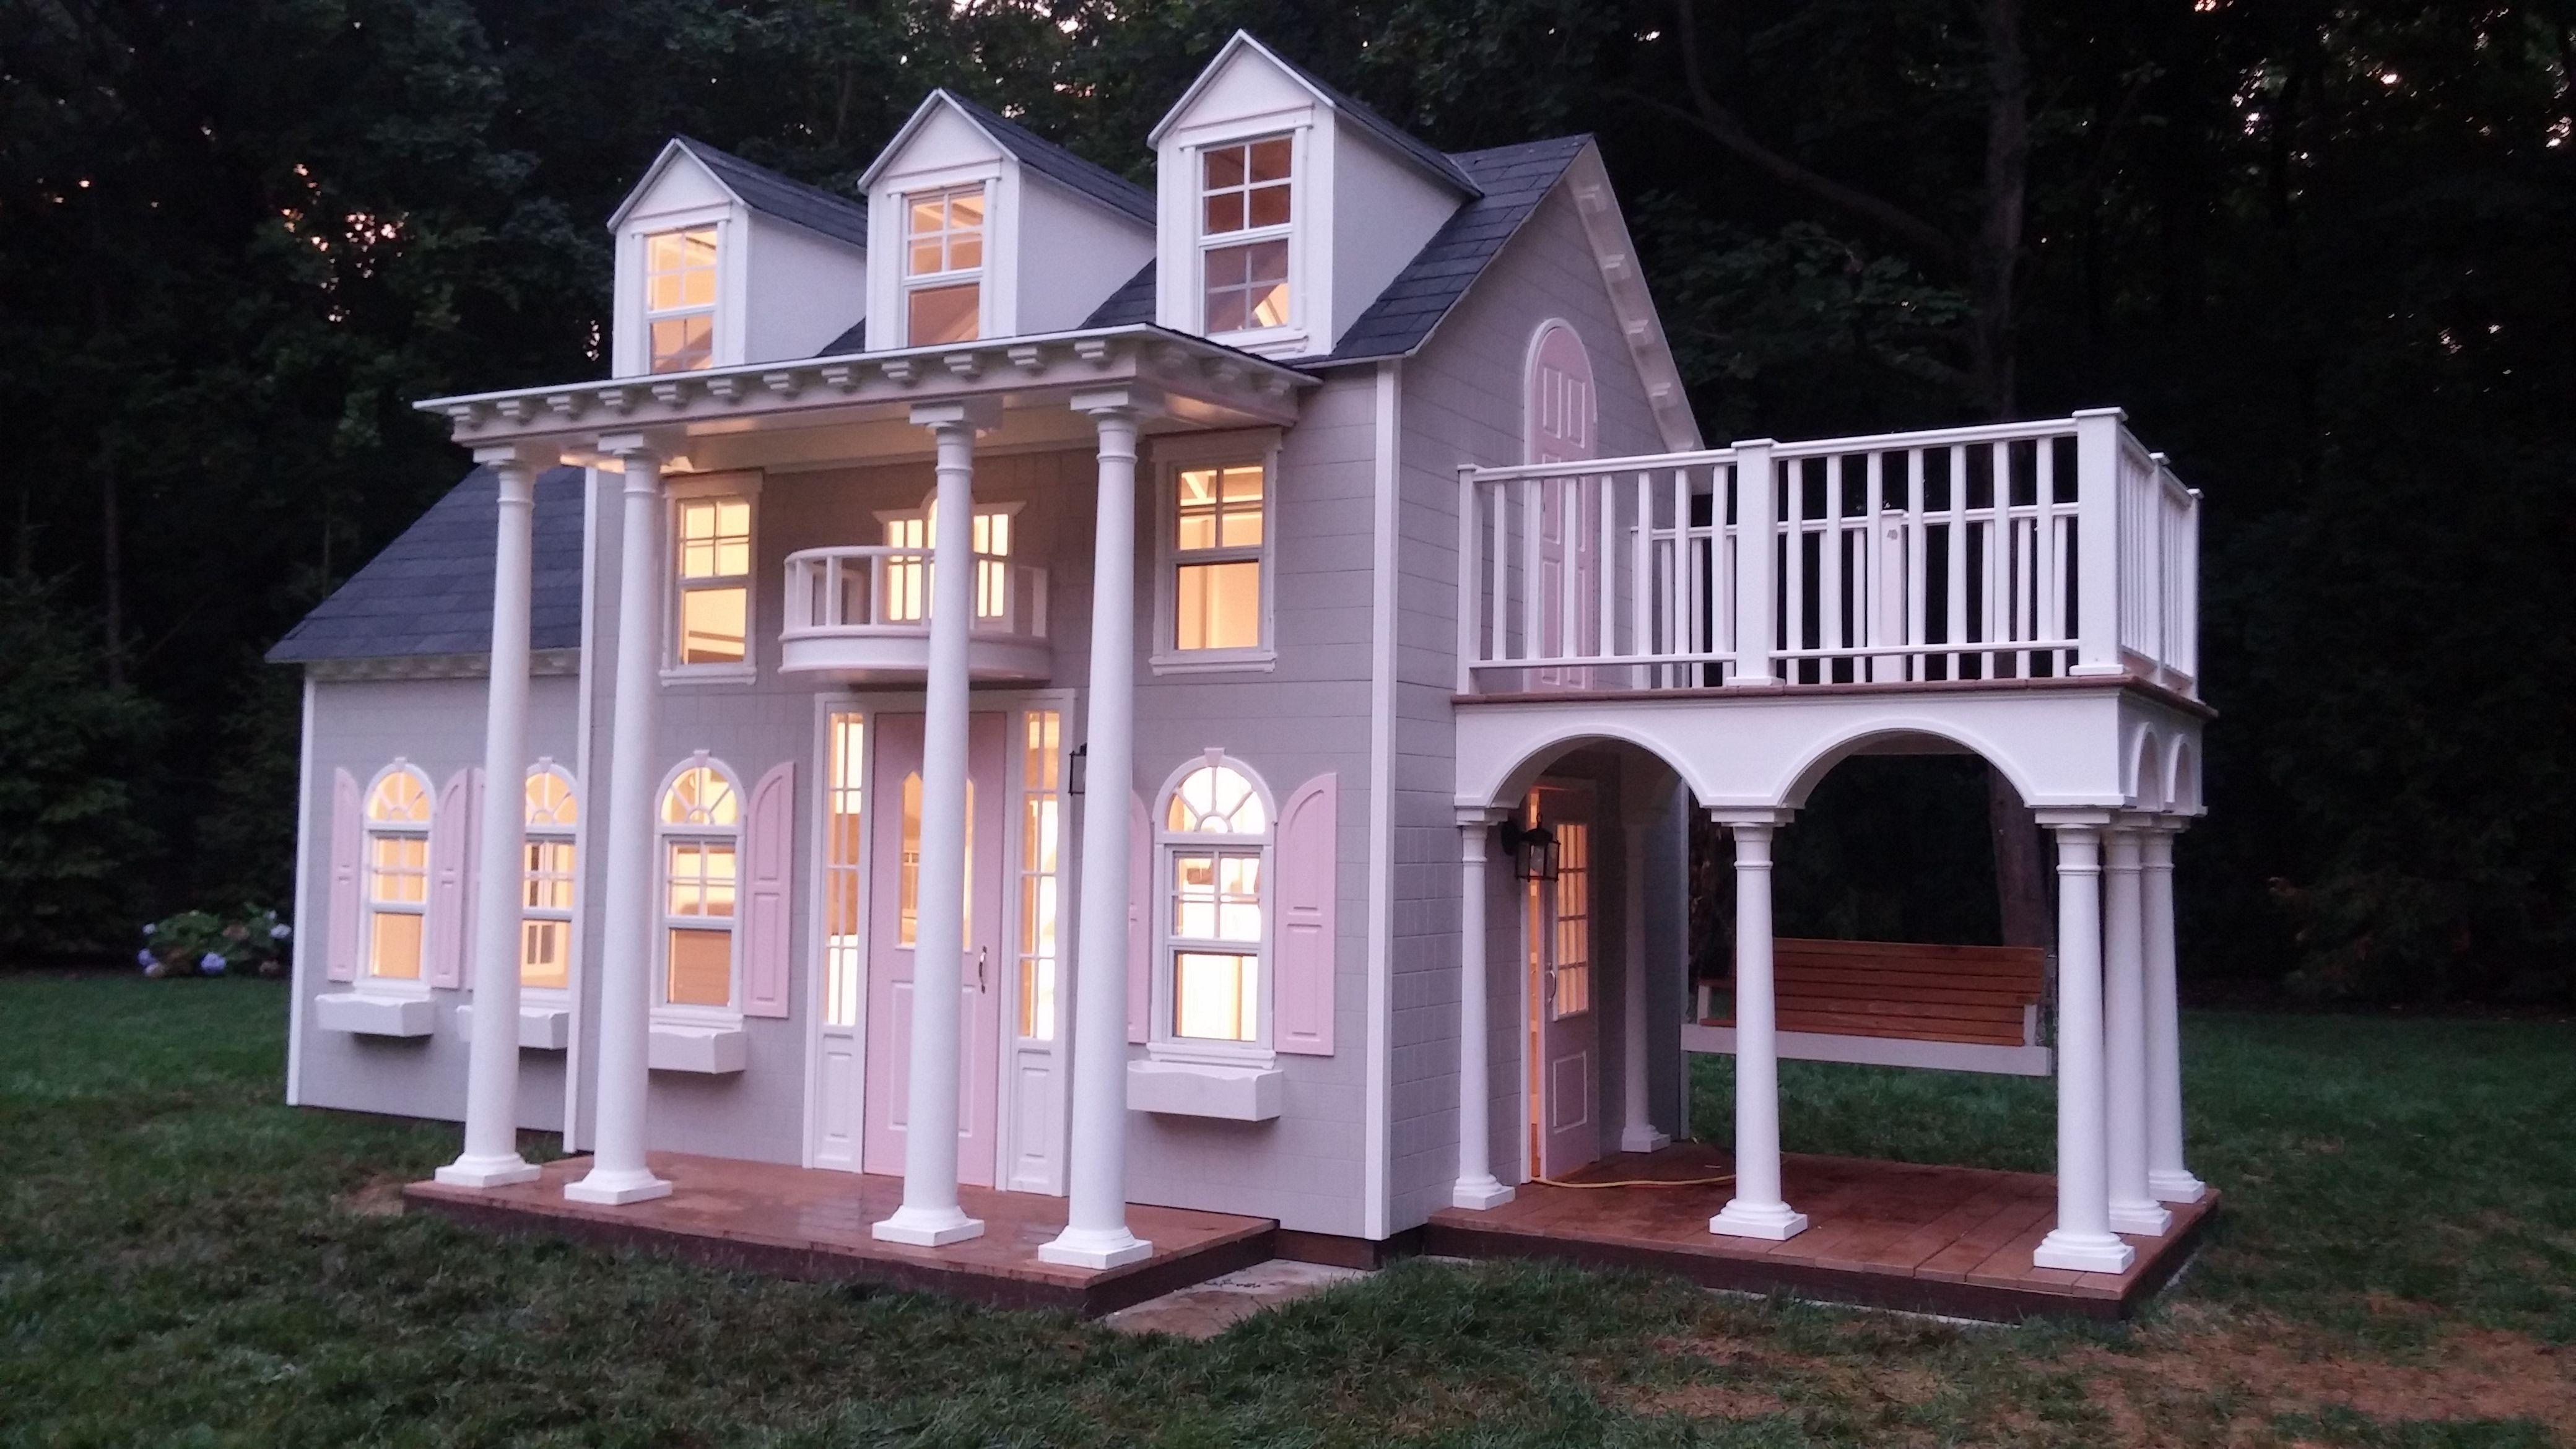 Gallery Lilliput Play Homes Custom Playhouses For Your Home Luxury Playhouses Playhouse Outdoor Play Houses